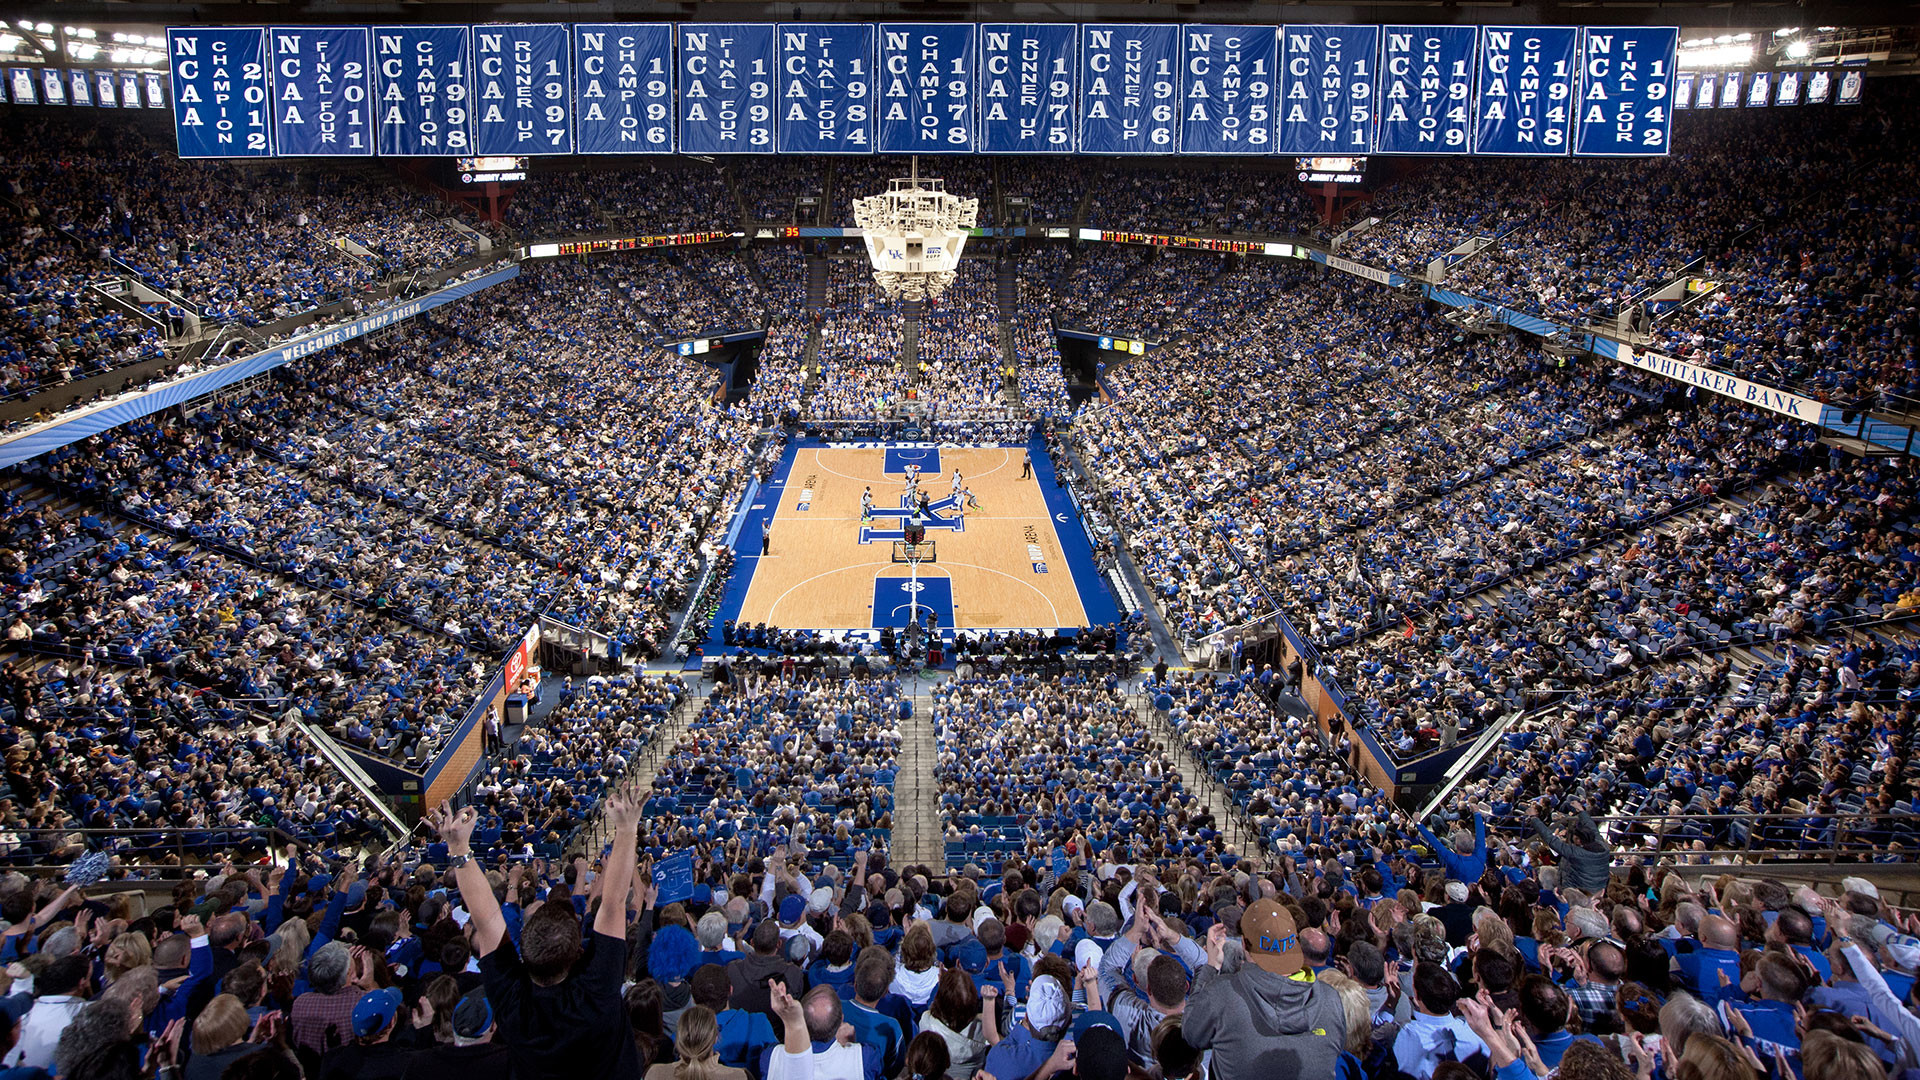 University Of Kentucky Chrome Themes Ios Wallpapers Kentucky Wildcats Basketball Arena 1920x1080 Wallpaper Teahub Io